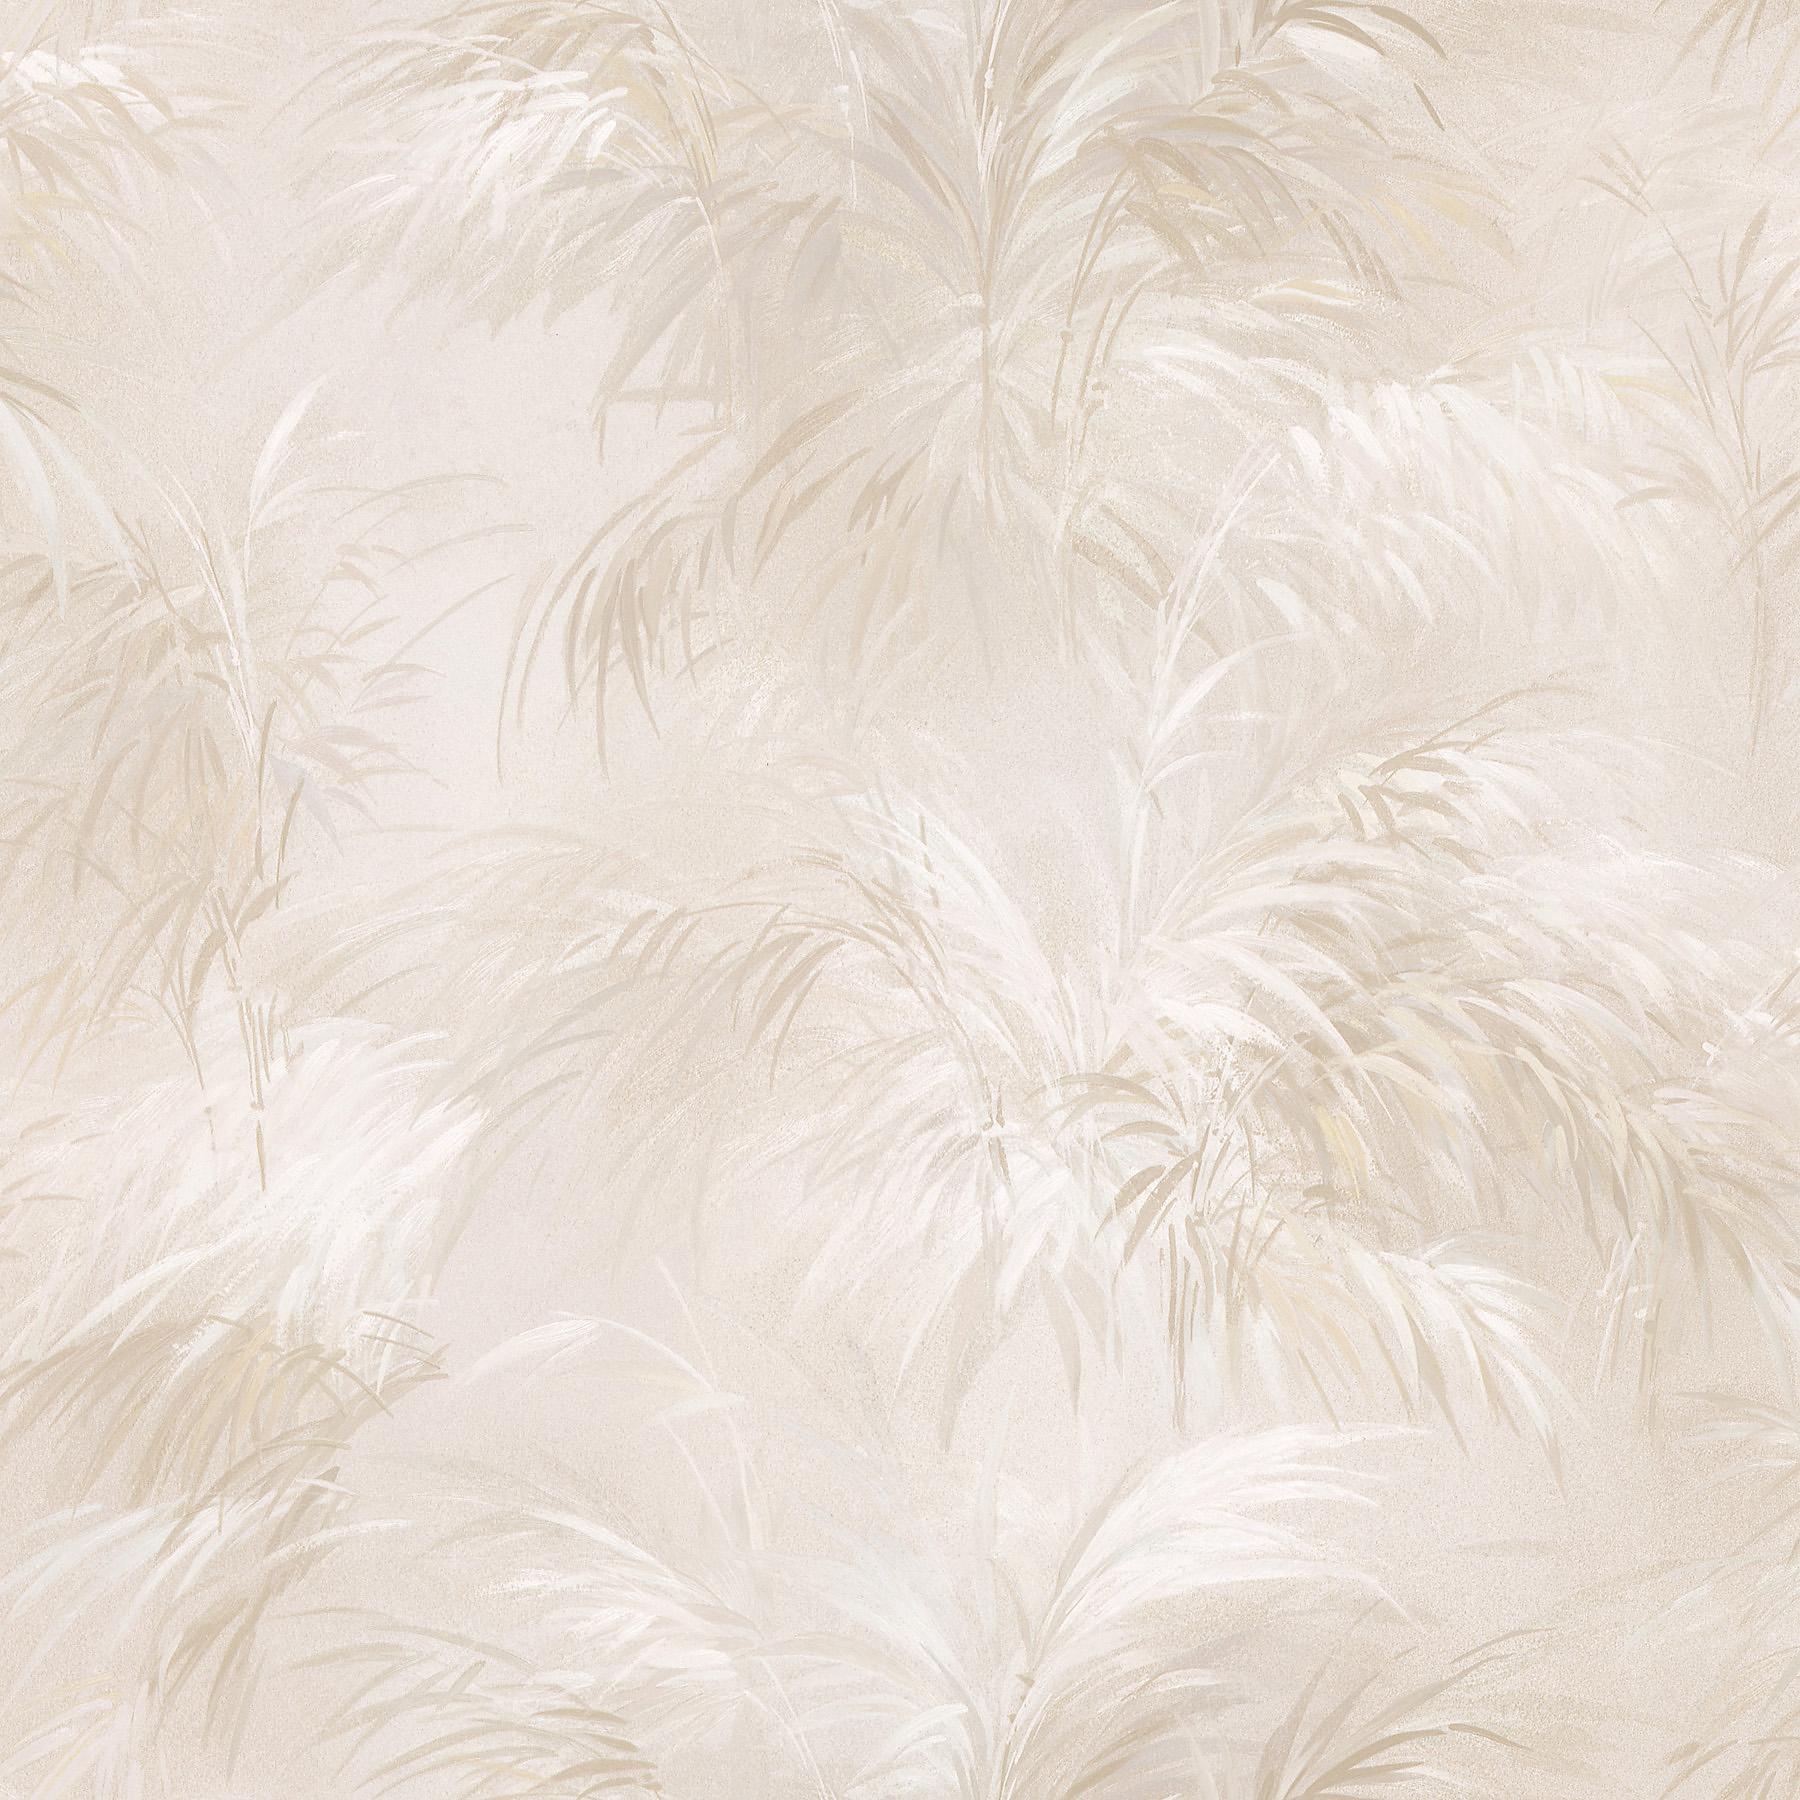 Brewster 2532 17656 Bath Bath Bath Iv Kaley Cream Satin Leaves Wallpaper Leaf Wallpaper Beige Wallpaper Embossed Wallpaper